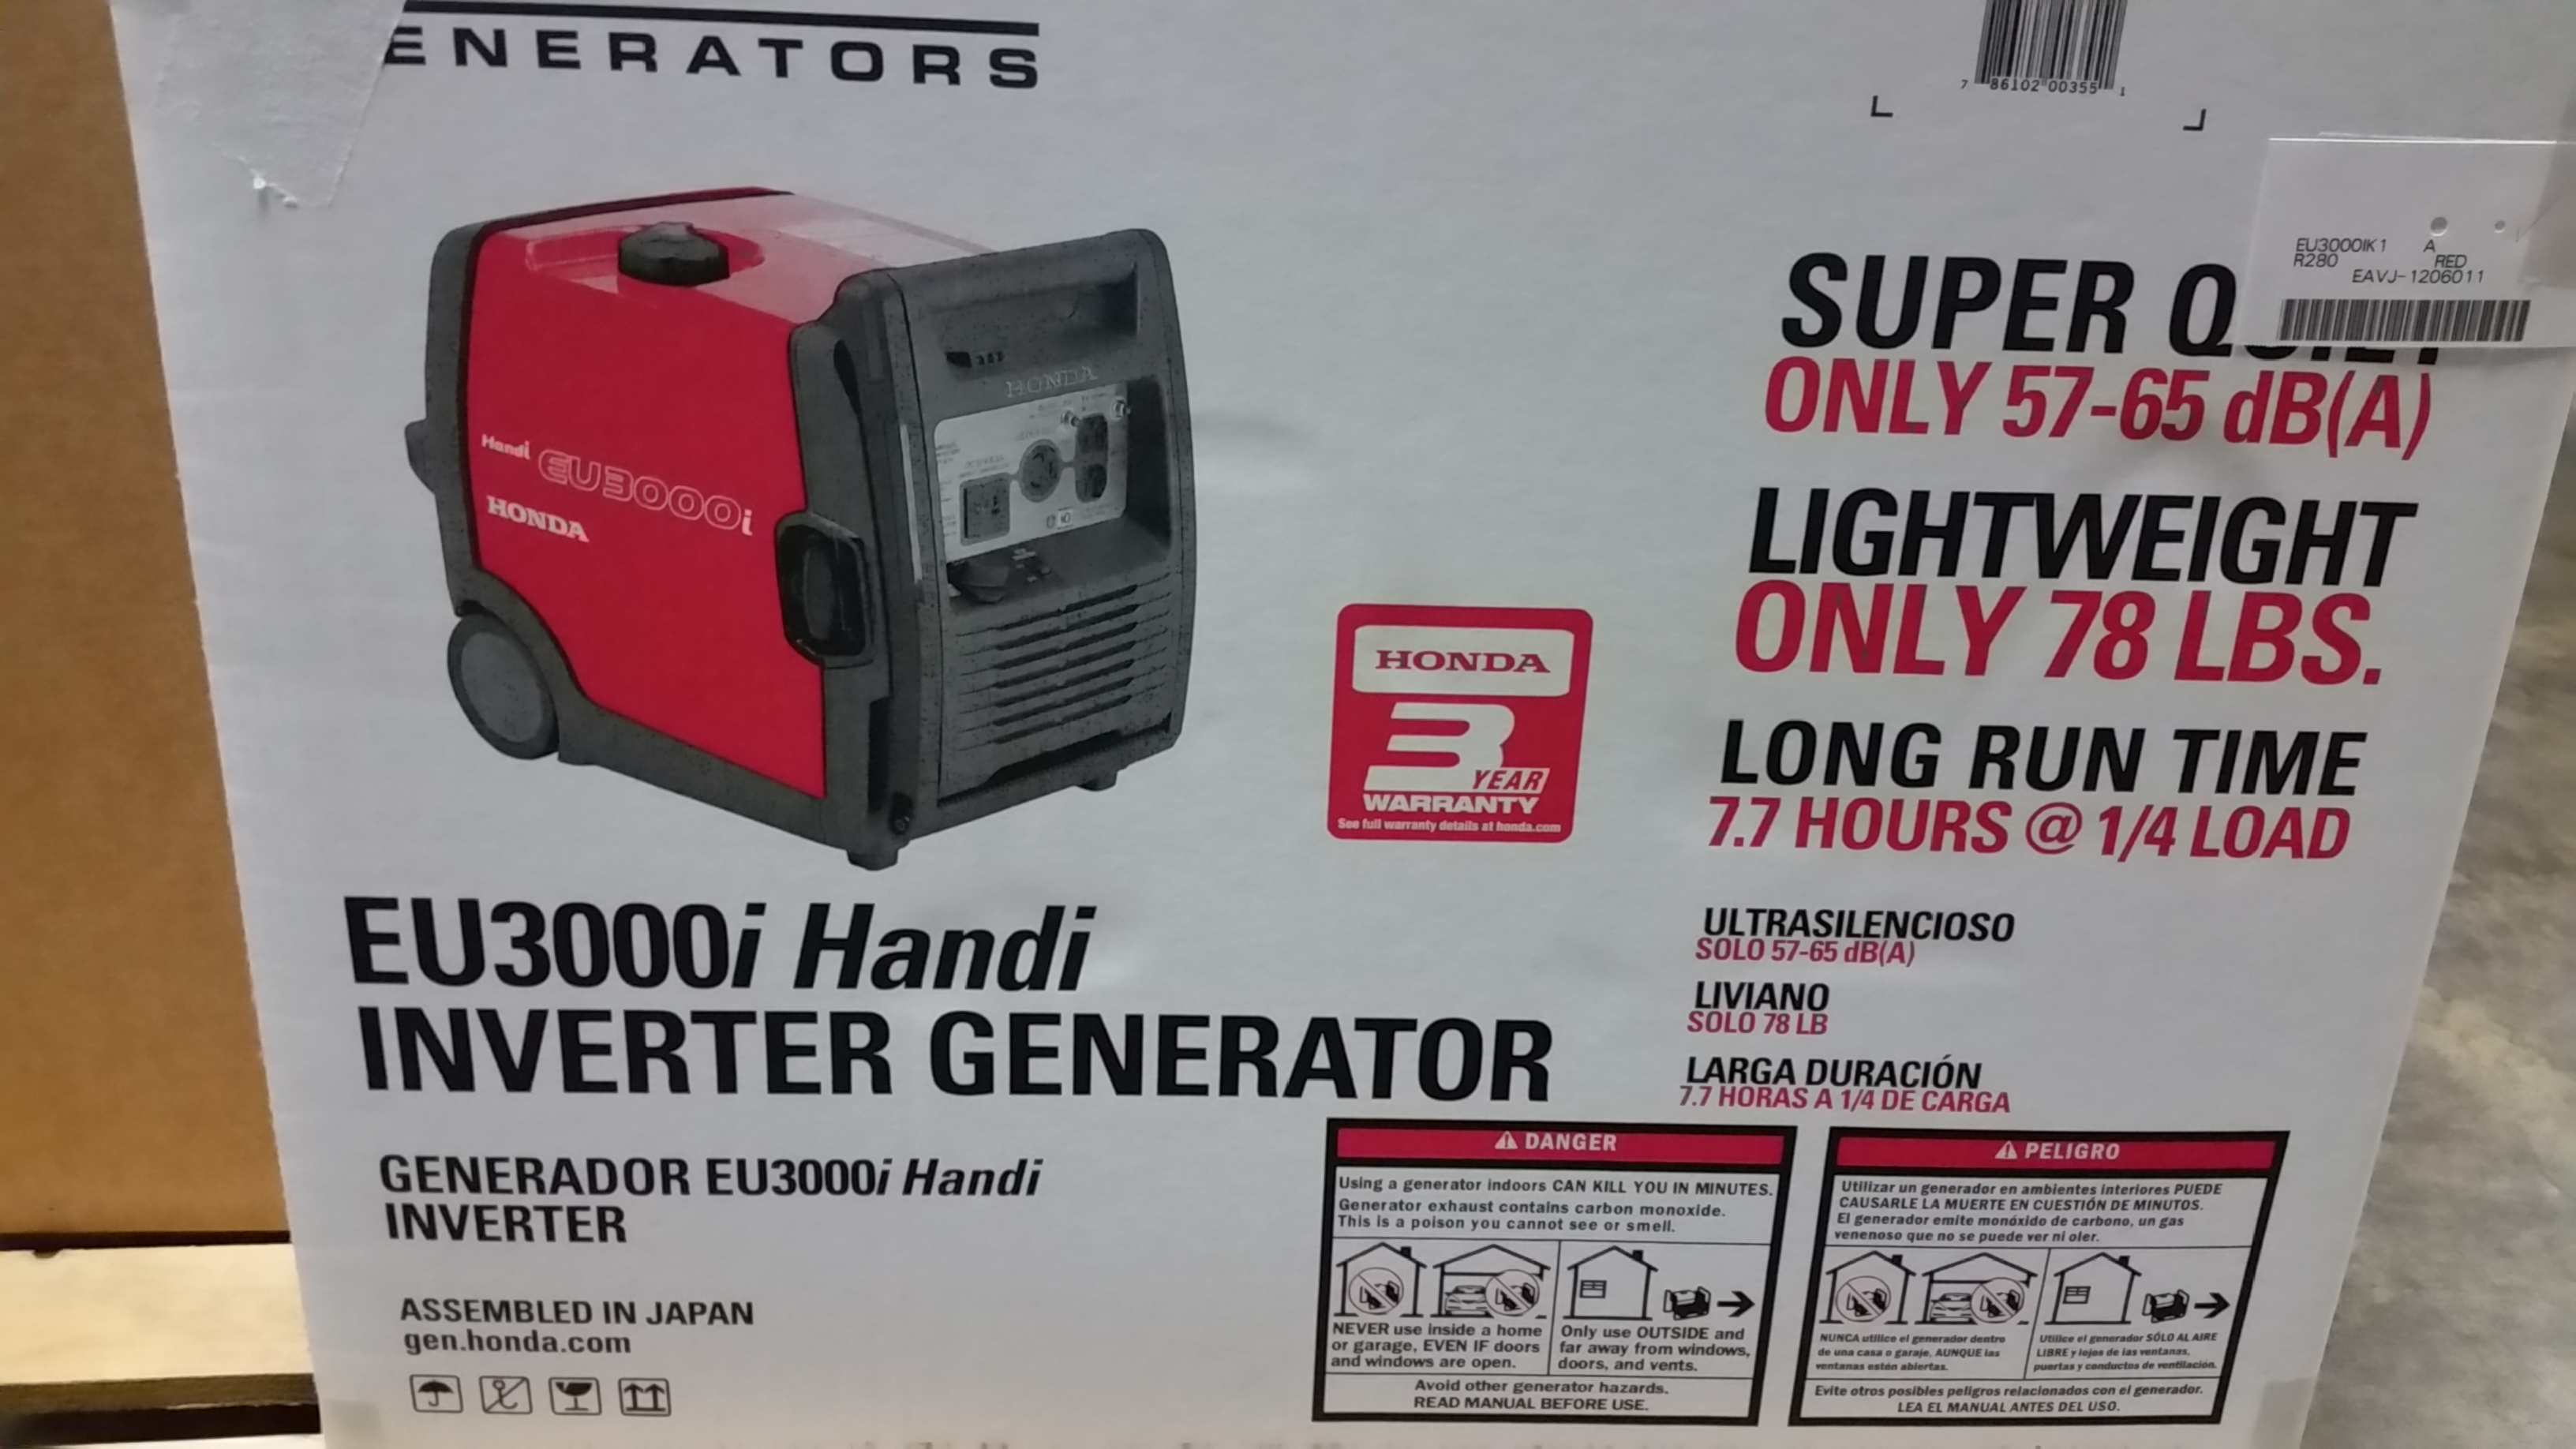 California - FOR SALE (NEW IN BOX) Generator HONDA EU3000I ...